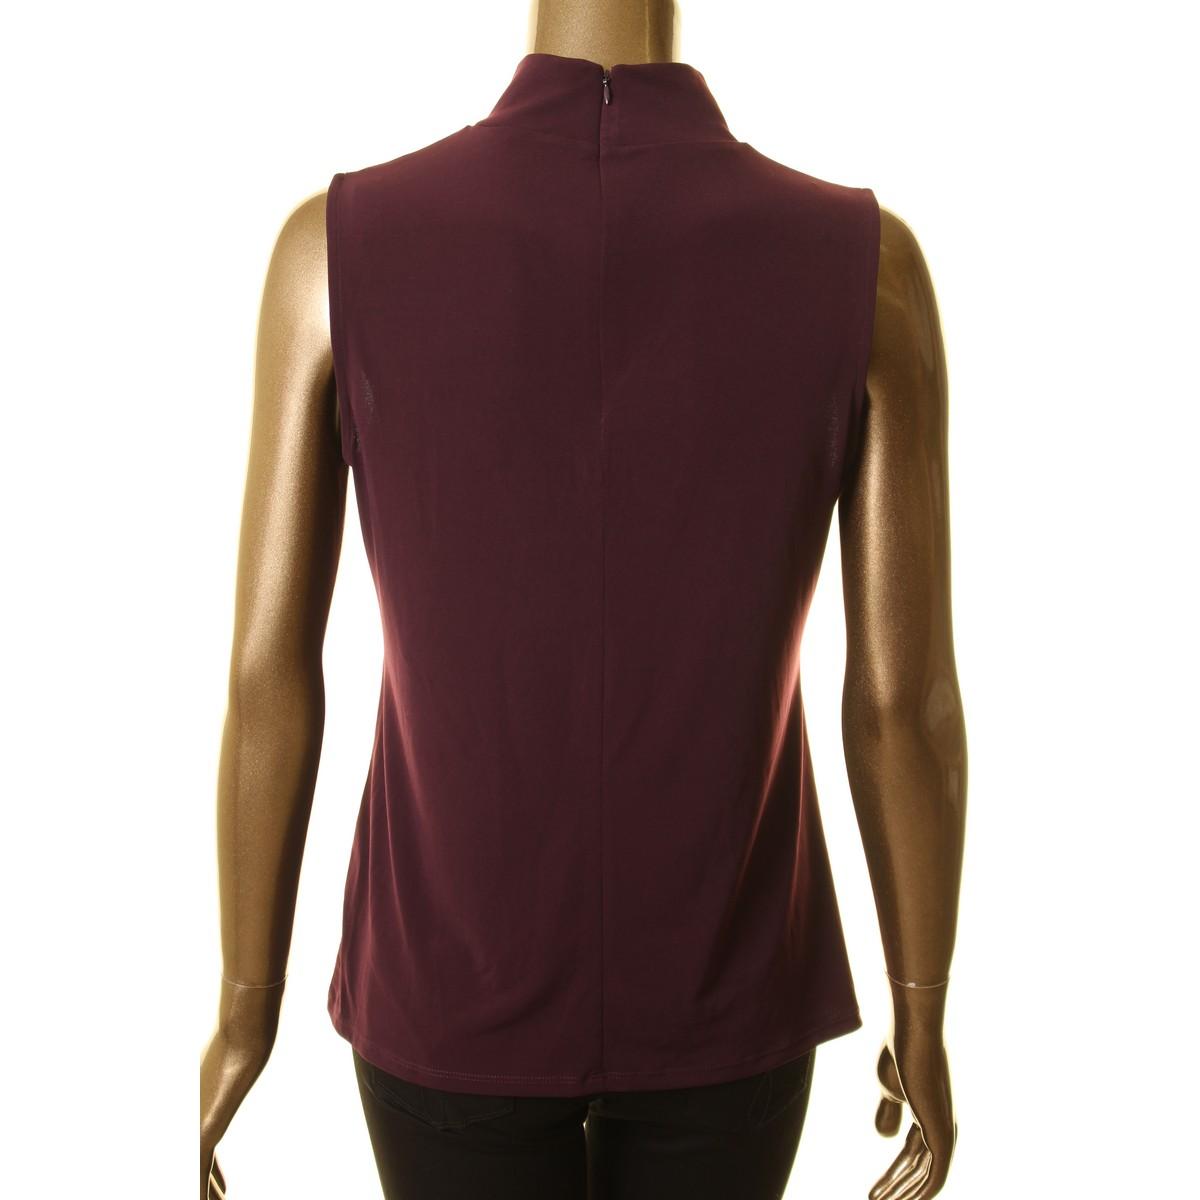 CALVIN-KLEIN-NEW-Women-039-s-Mixed-media-Mock-Neck-Blouse-Shirt-Top-TEDO thumbnail 4